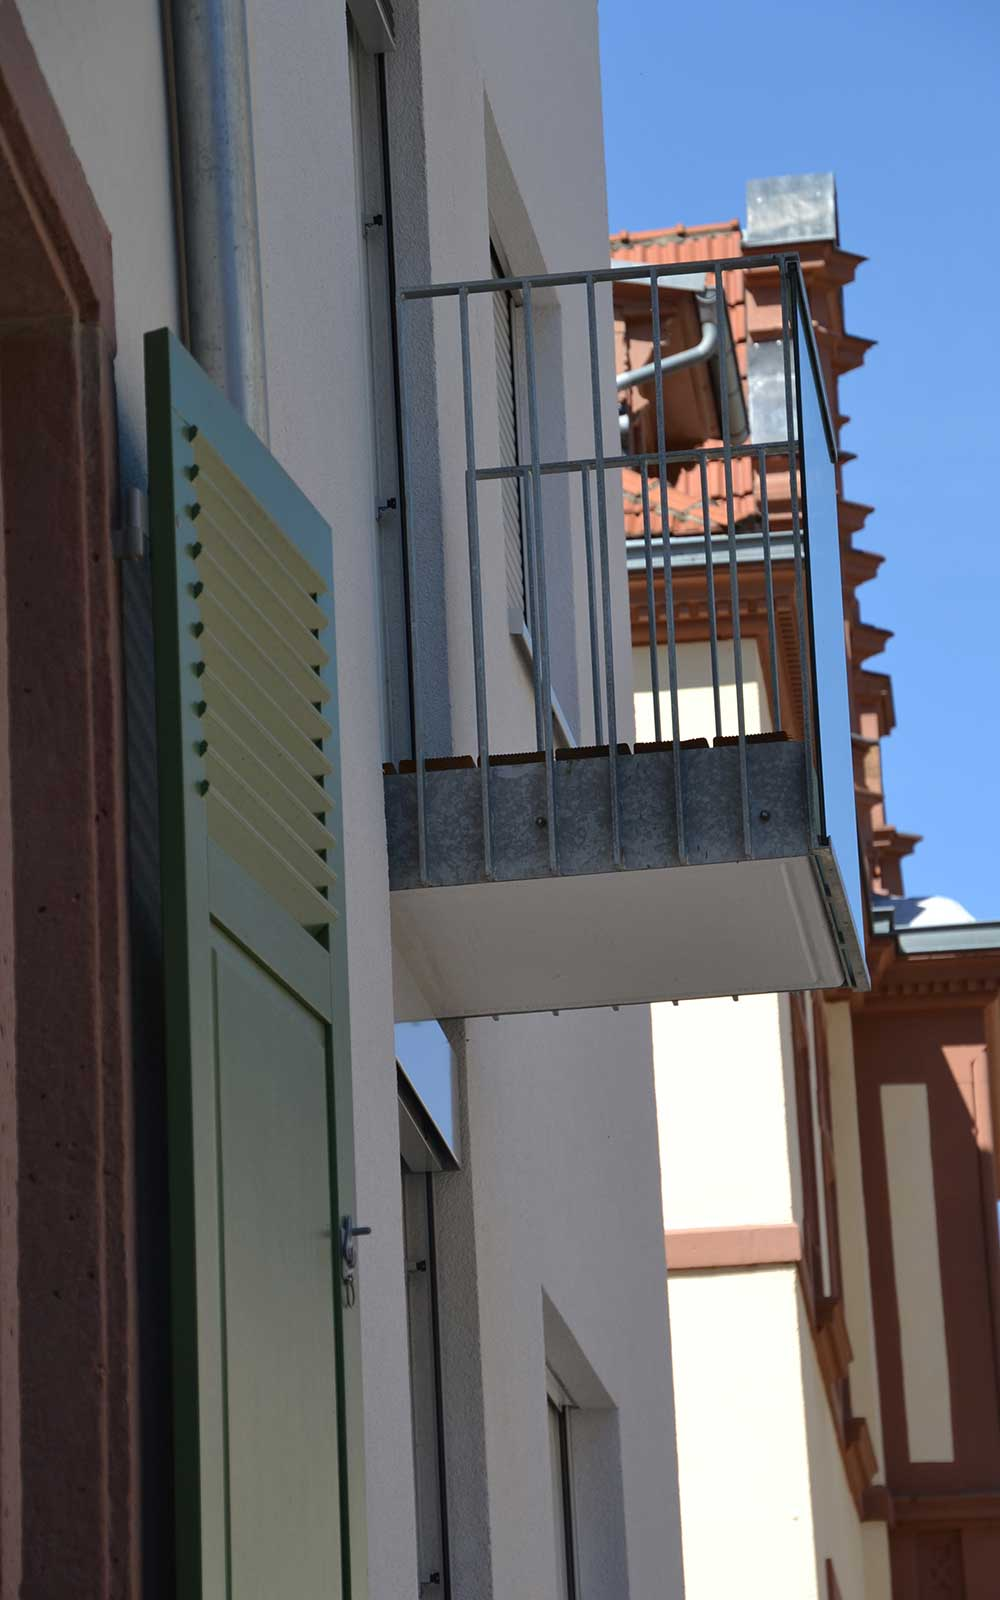 mehrfamilienhaus west kochhan weckbach architekten heidelberg. Black Bedroom Furniture Sets. Home Design Ideas